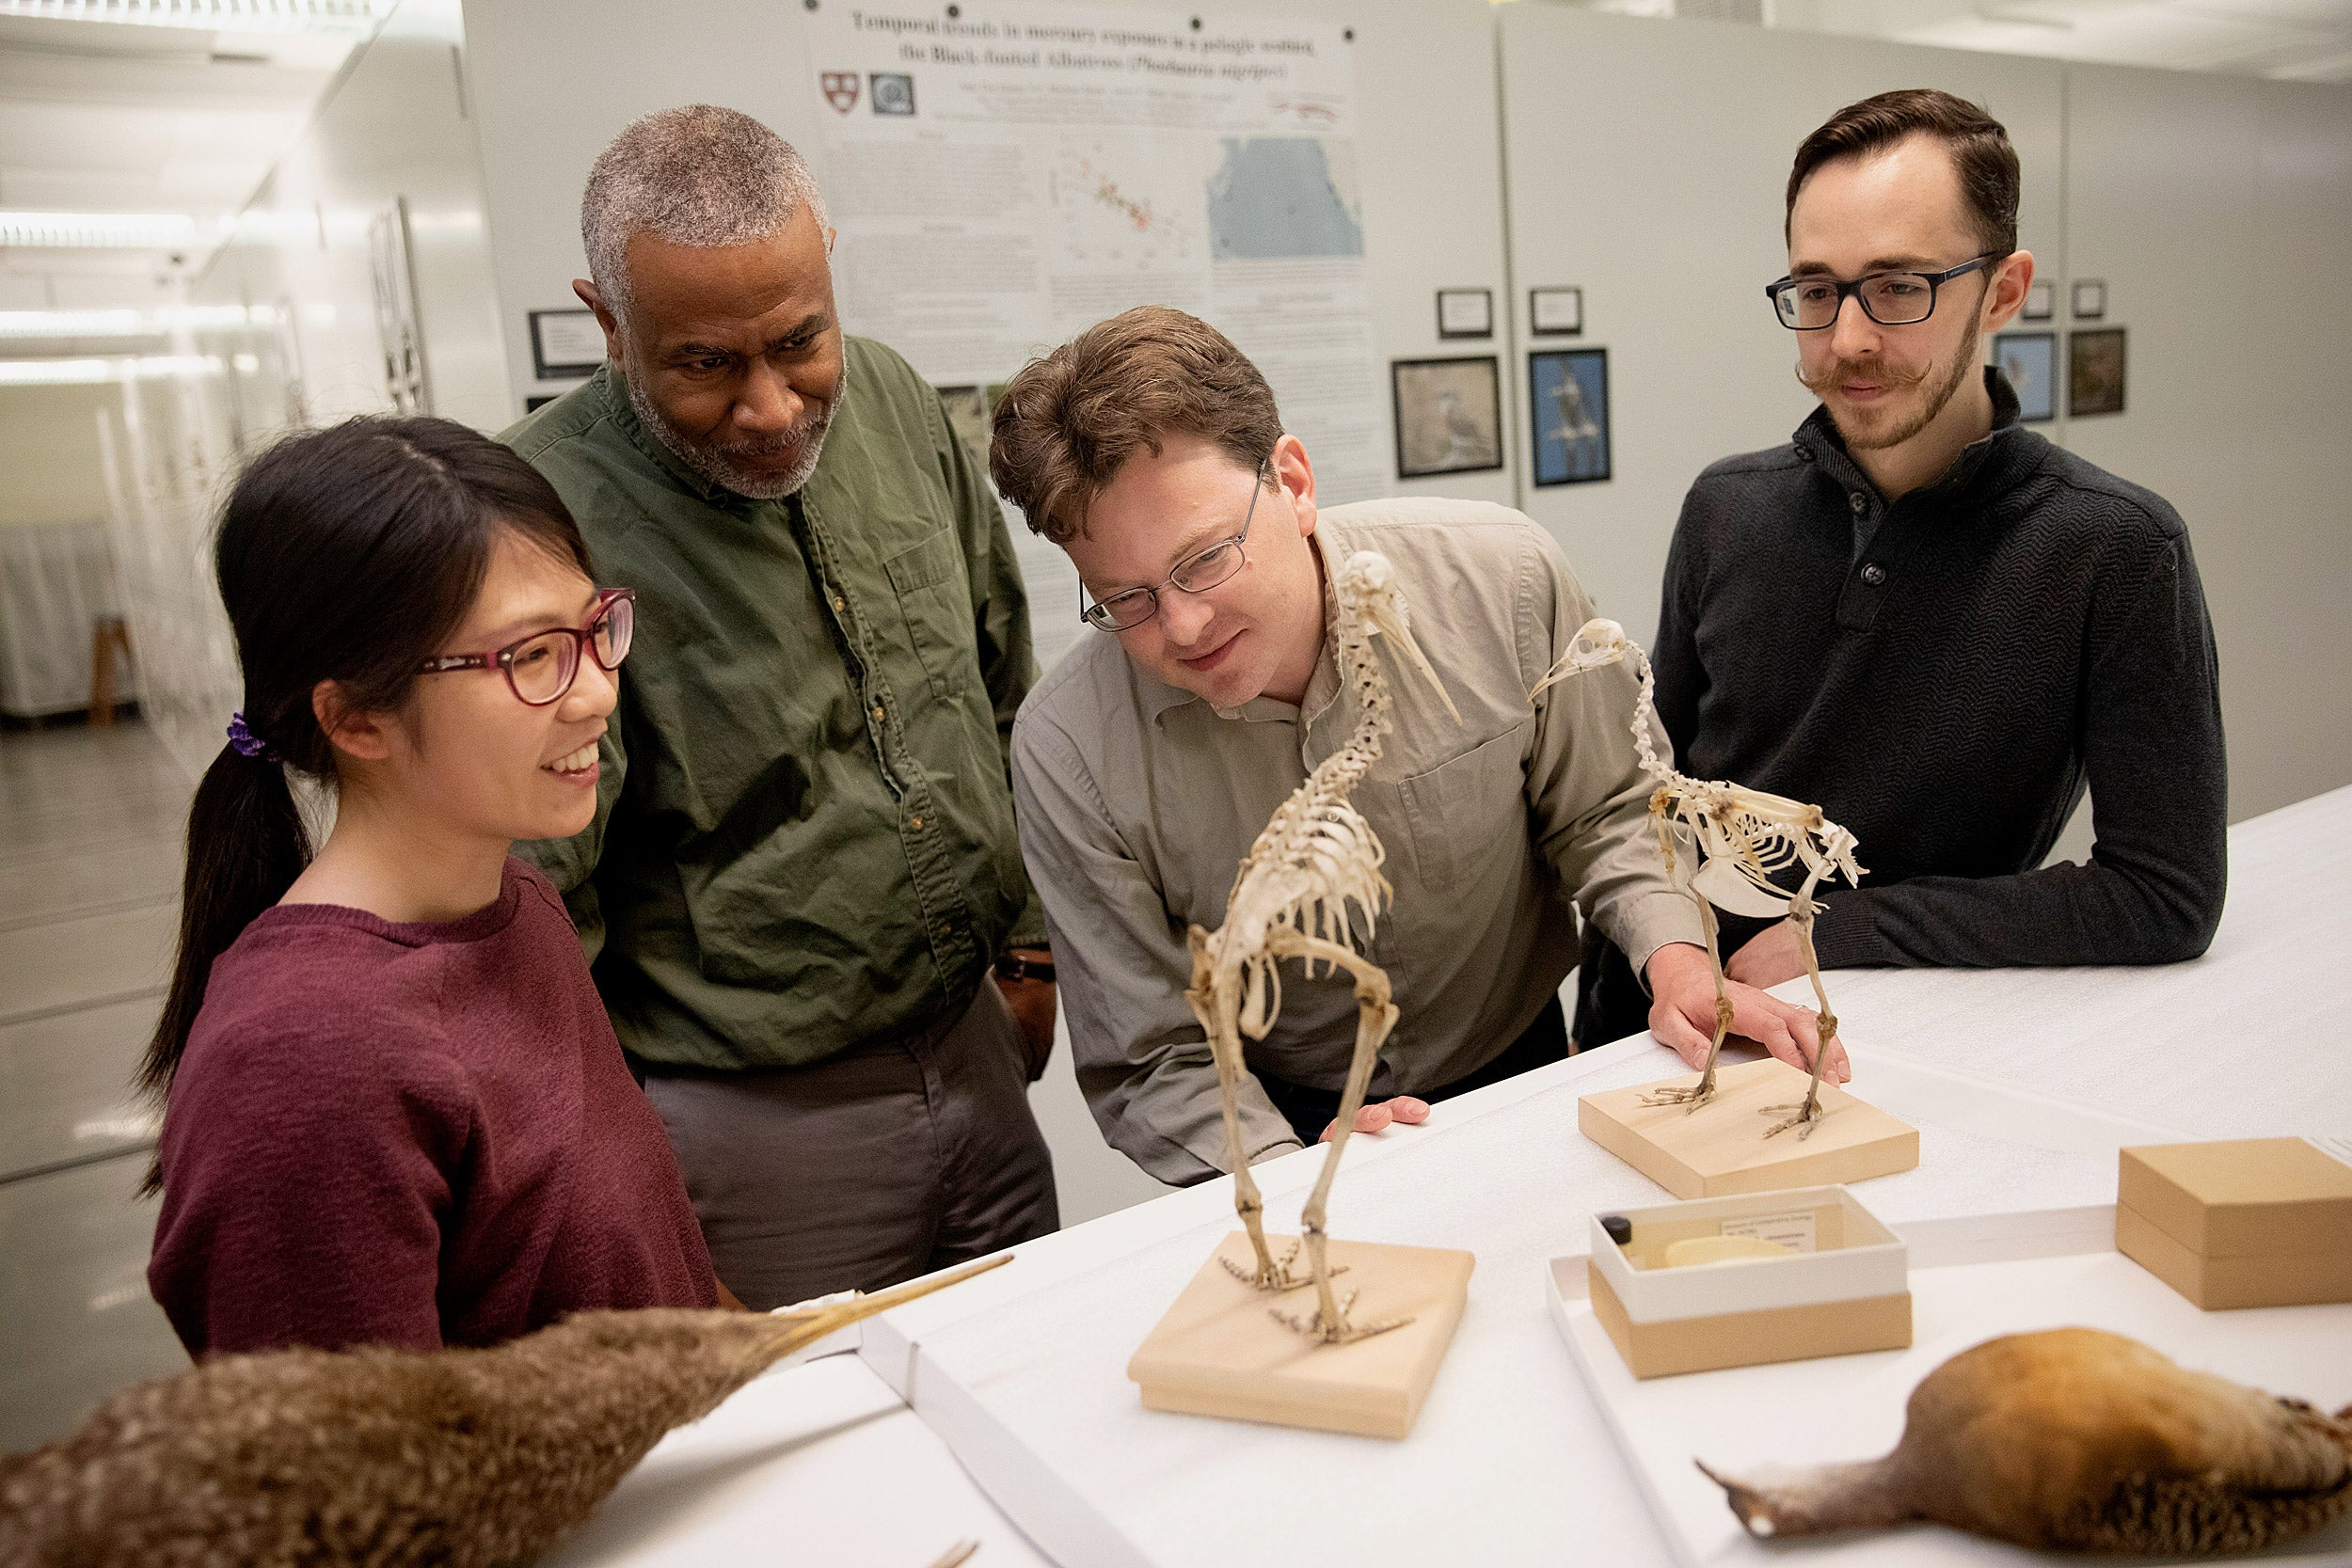 Researchers display skeletons of flightless birds.